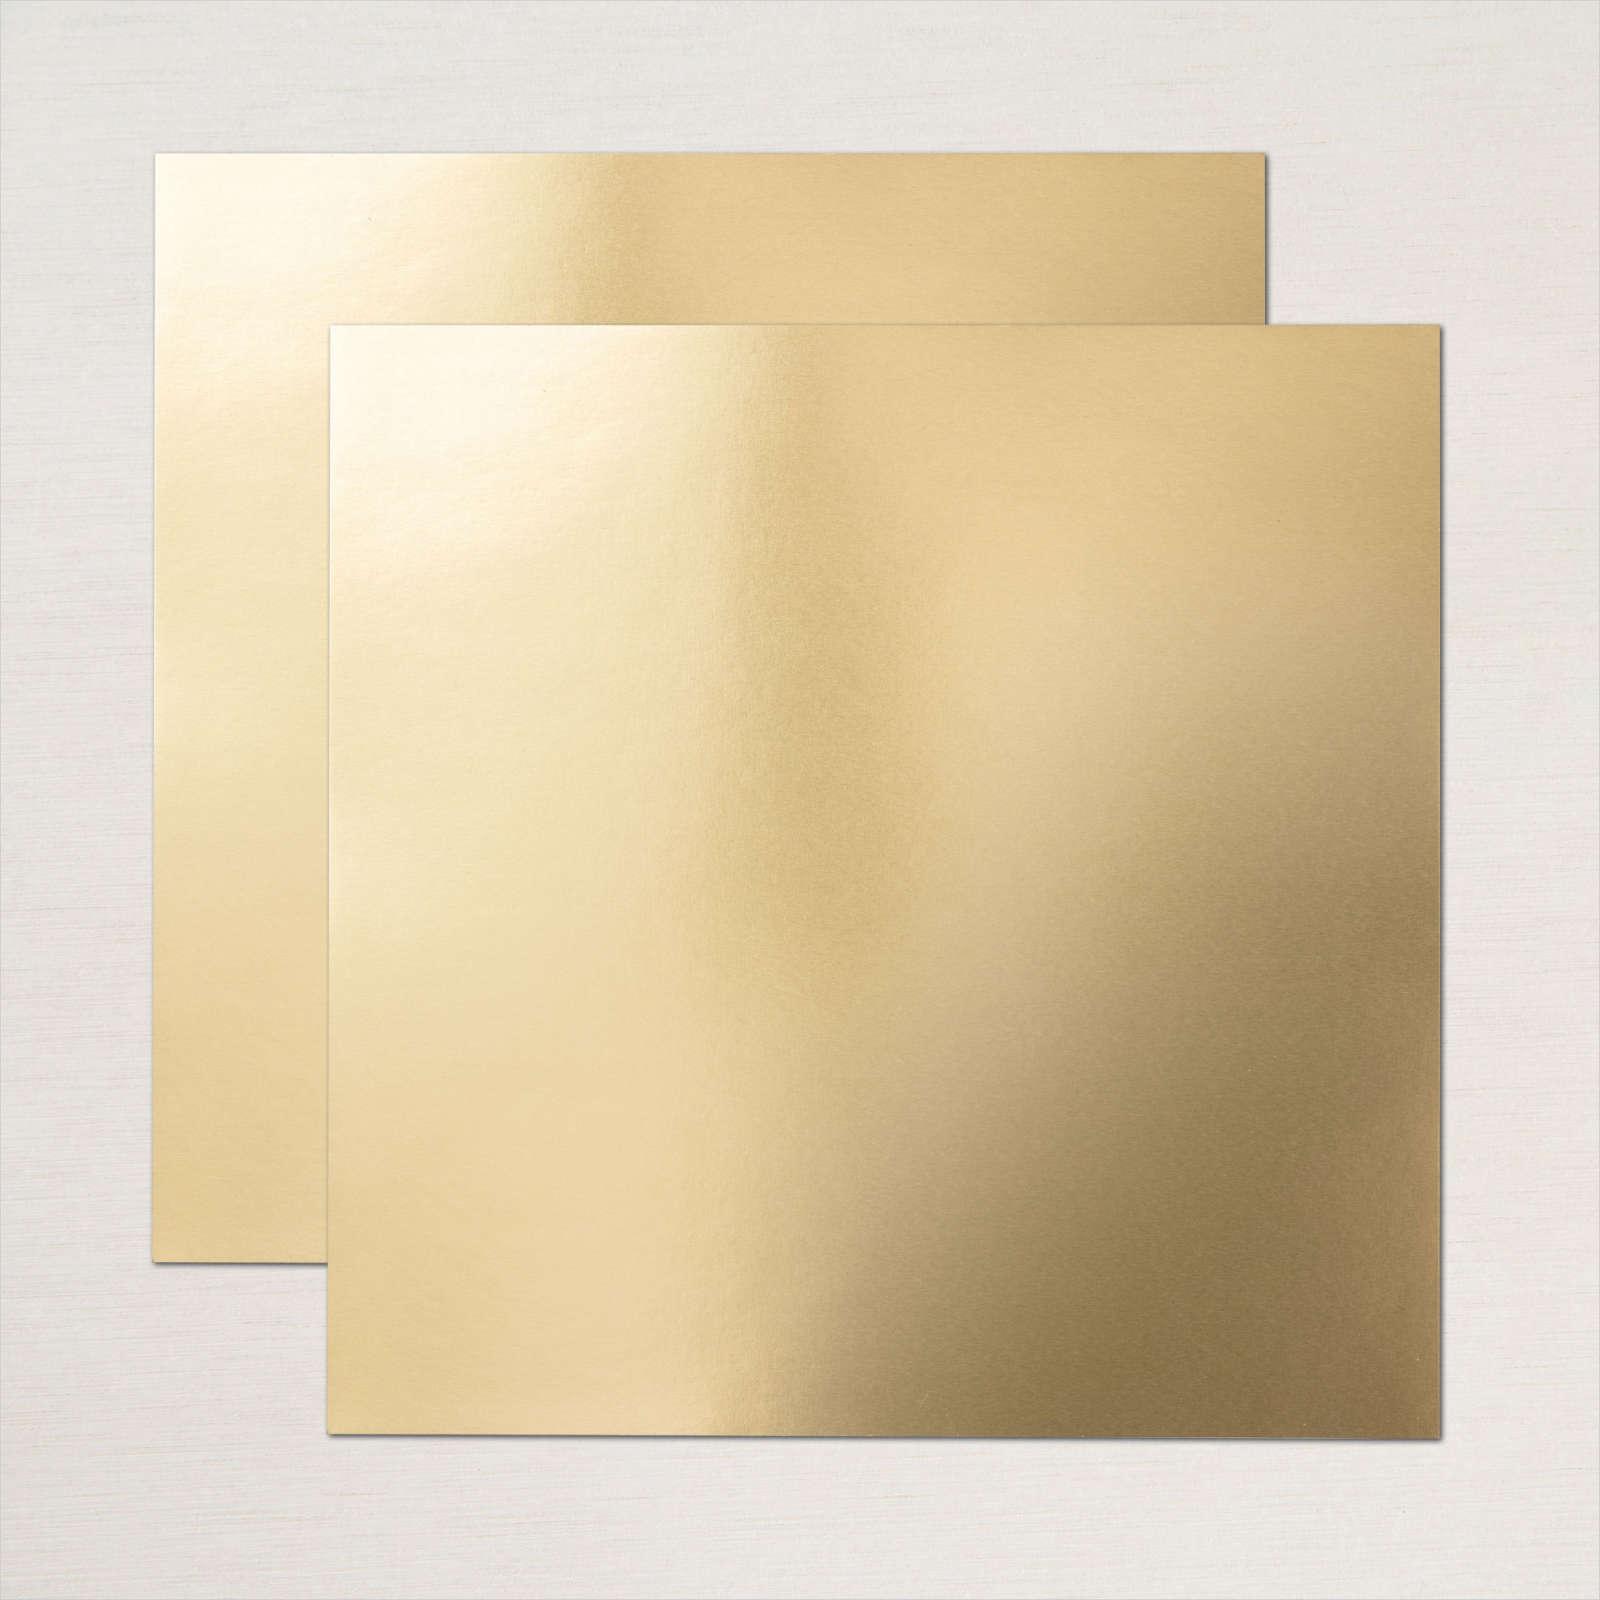 METALLIC-FOLIENPAPIER IN GOLD